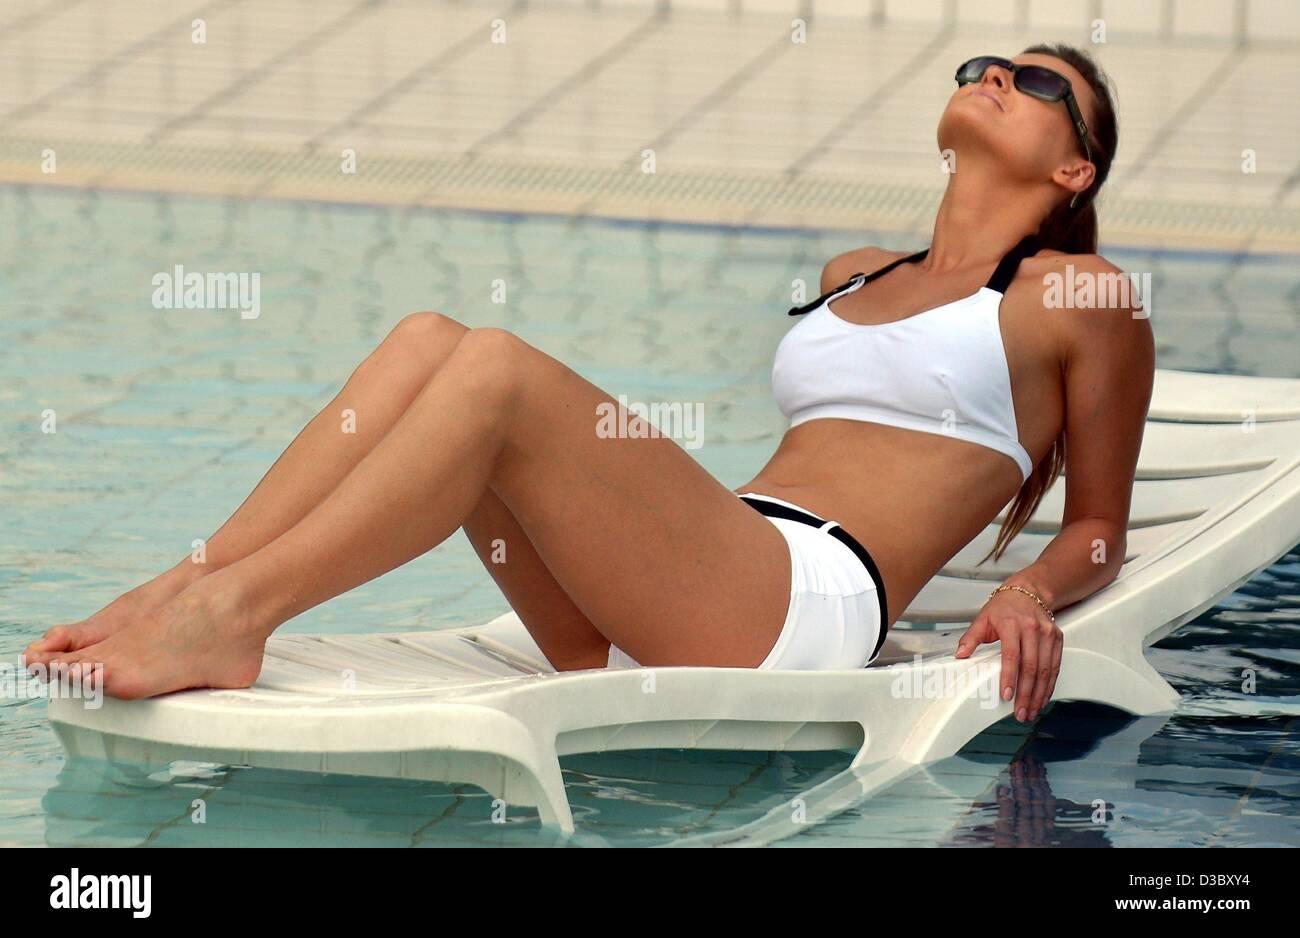 77ebc9b20491 Bathing Beach Fashion Woman In Imágenes De Stock & Bathing Beach ...